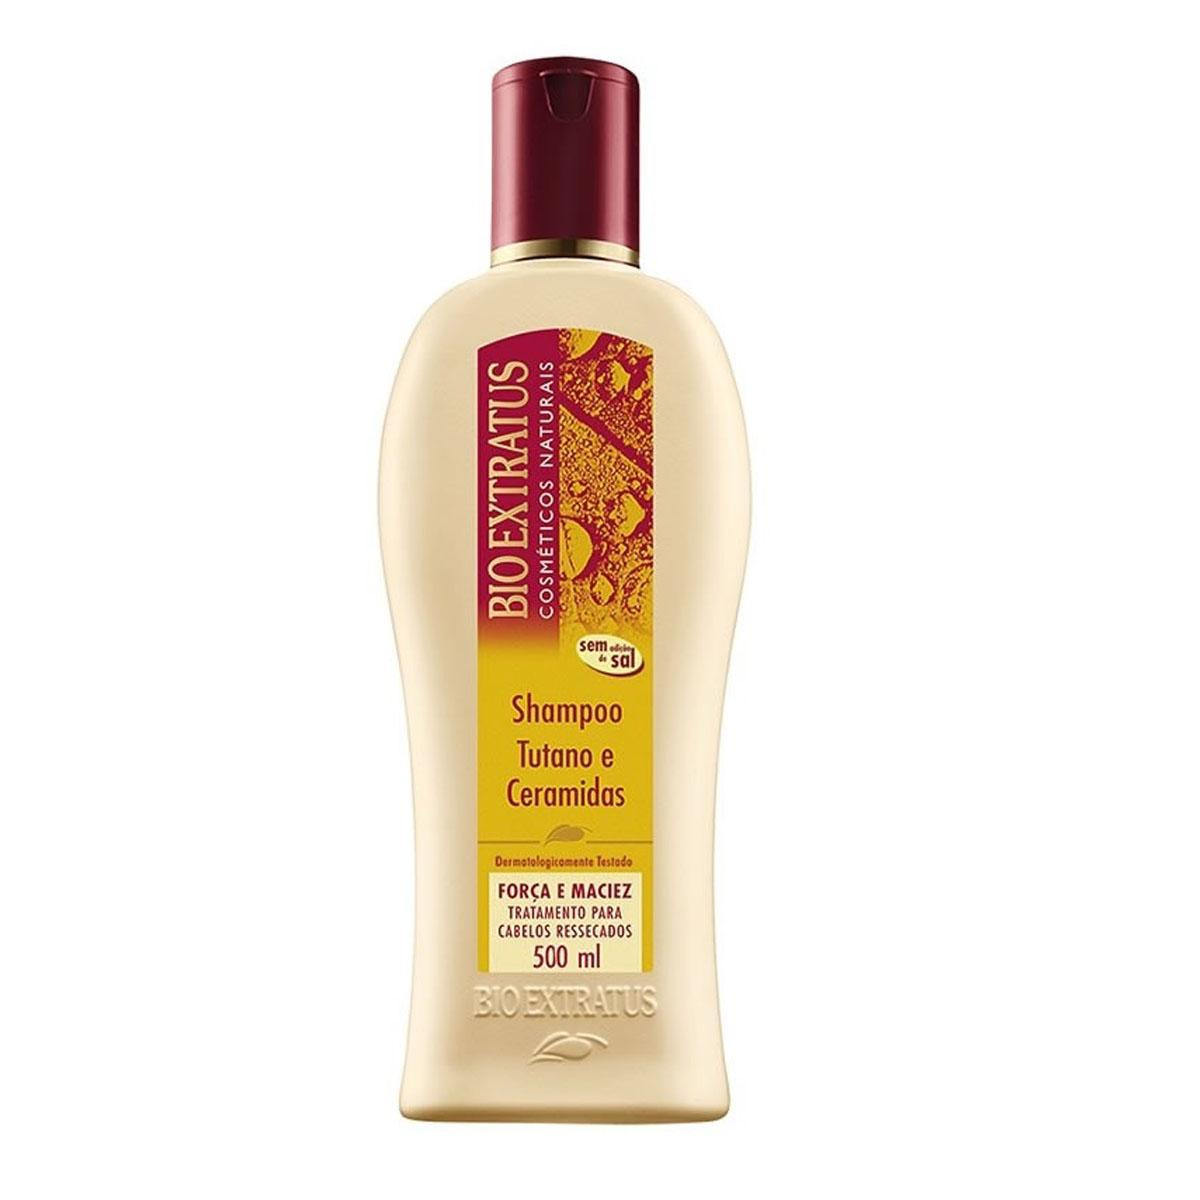 Bio Extratus Tutano Shampoo 500ml